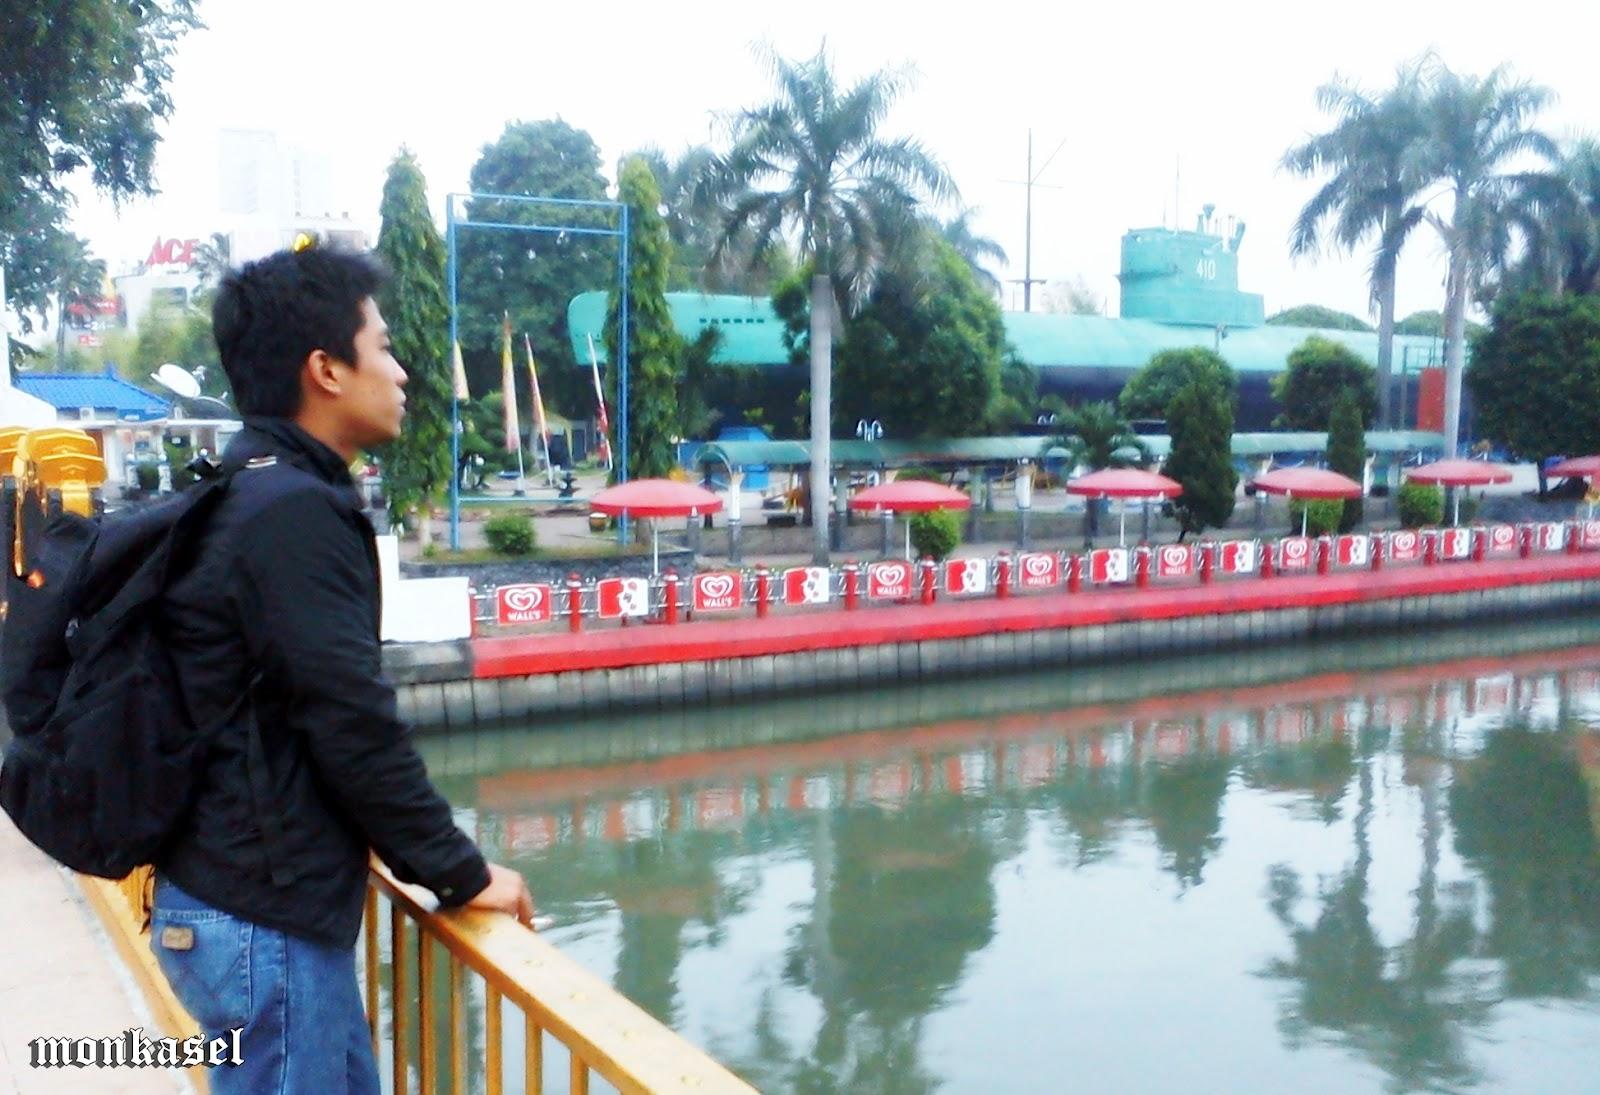 Berwisata Monumen Kapal Selam Adyatama Blog Tiket Masuk Sekitar 5